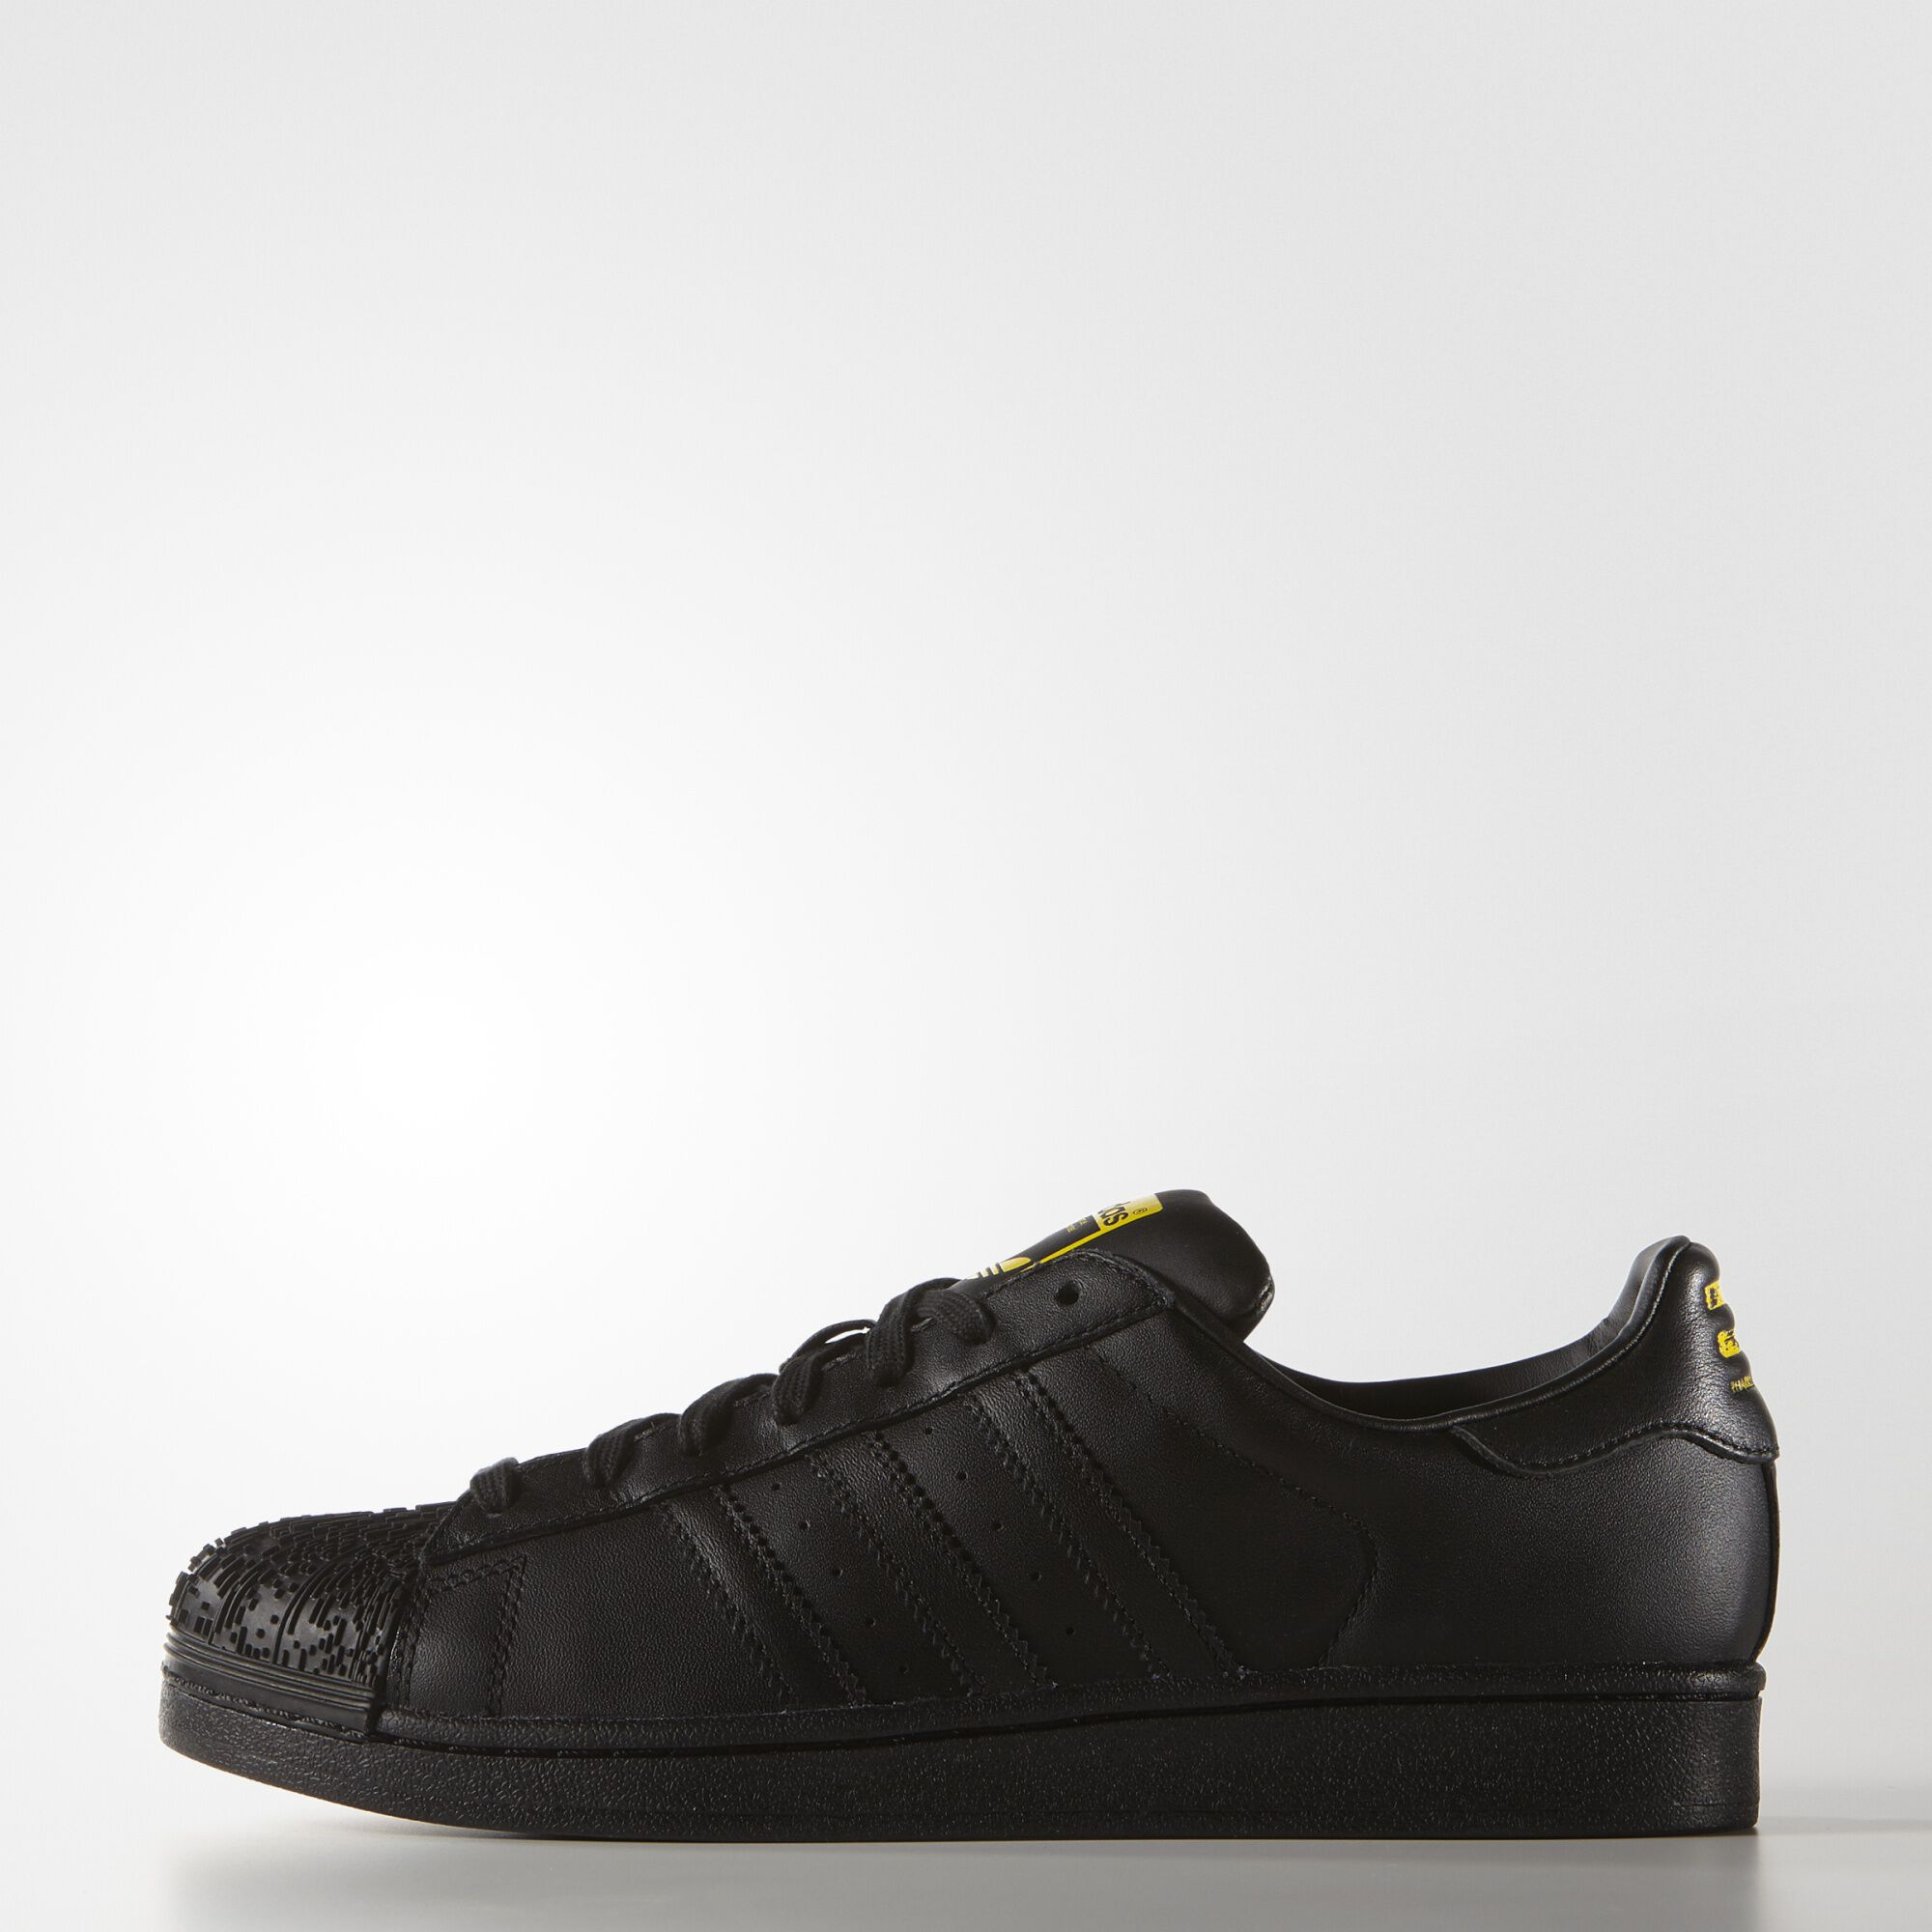 adidas superstar junior canada   PQPM ECE 09b2cfc39997